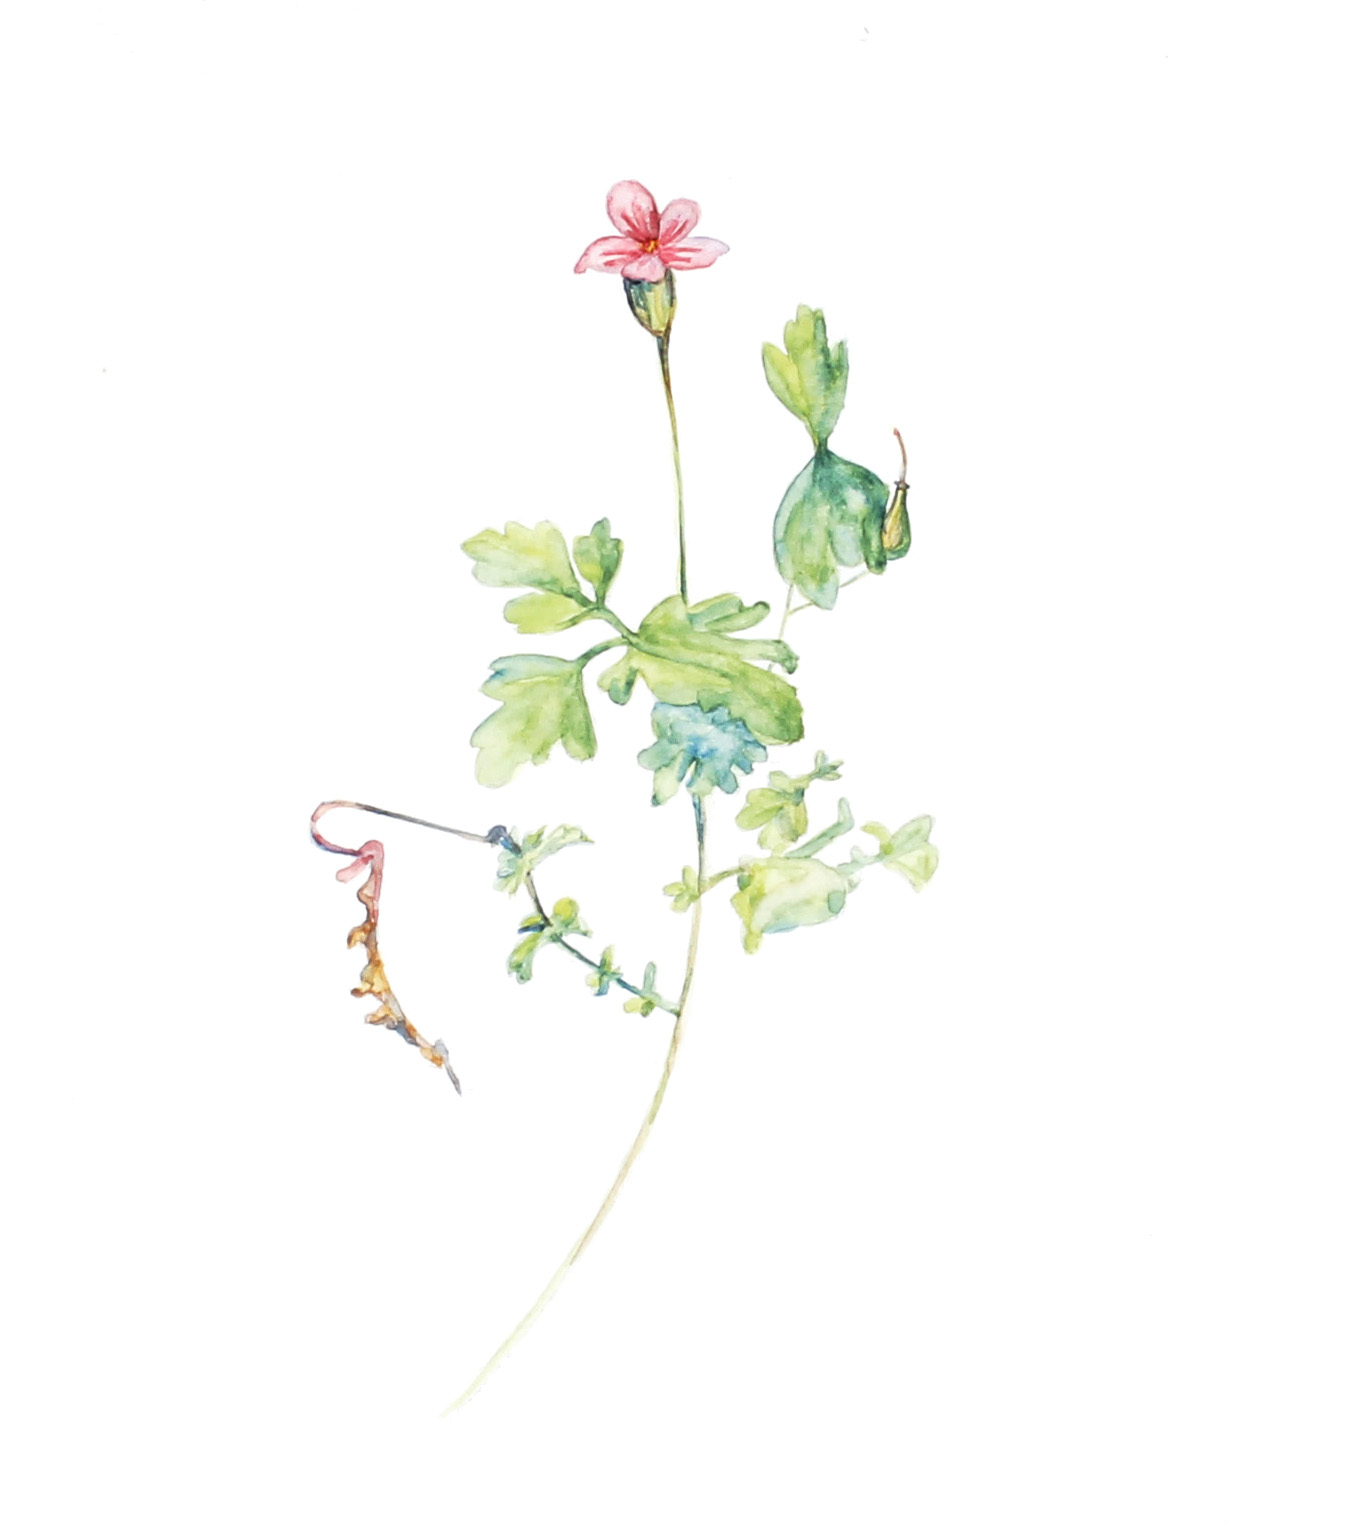 Geranium robertianum    Herb Robert